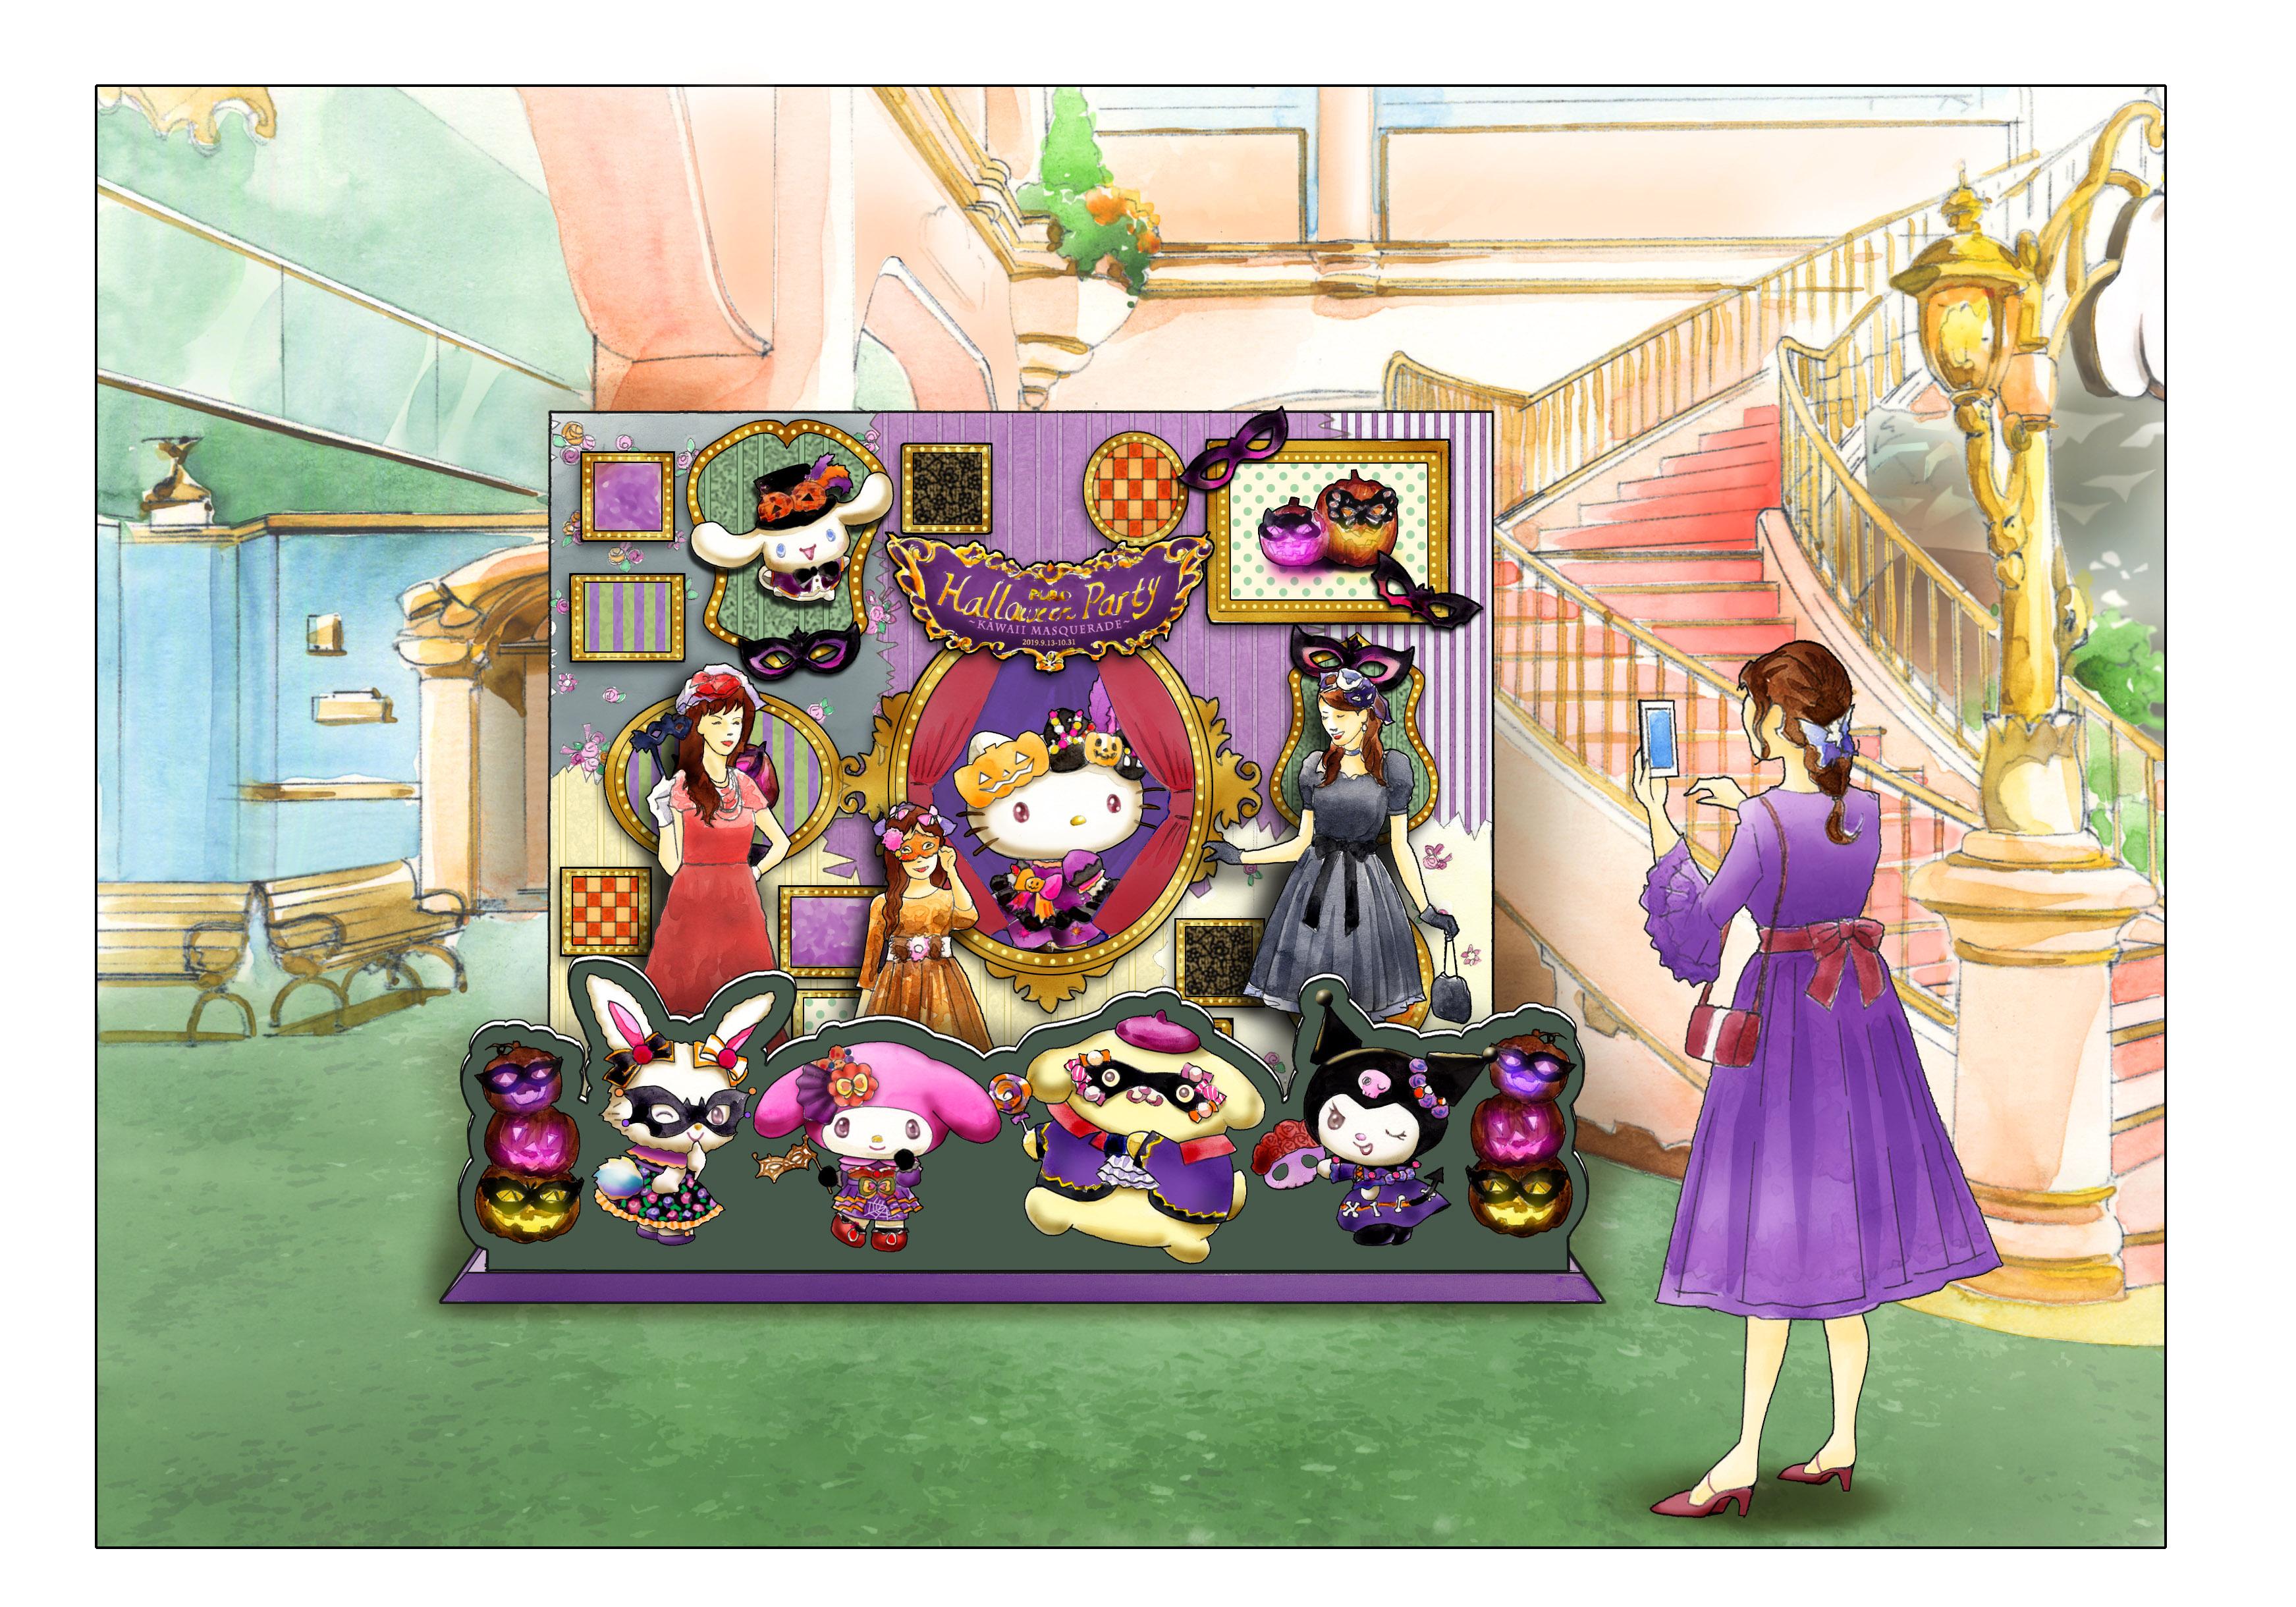 Witness Hello Kitty's scary side at Hello Kitty Land Tokyo - Kawaii Masquerade - this Halloween - Alvinology